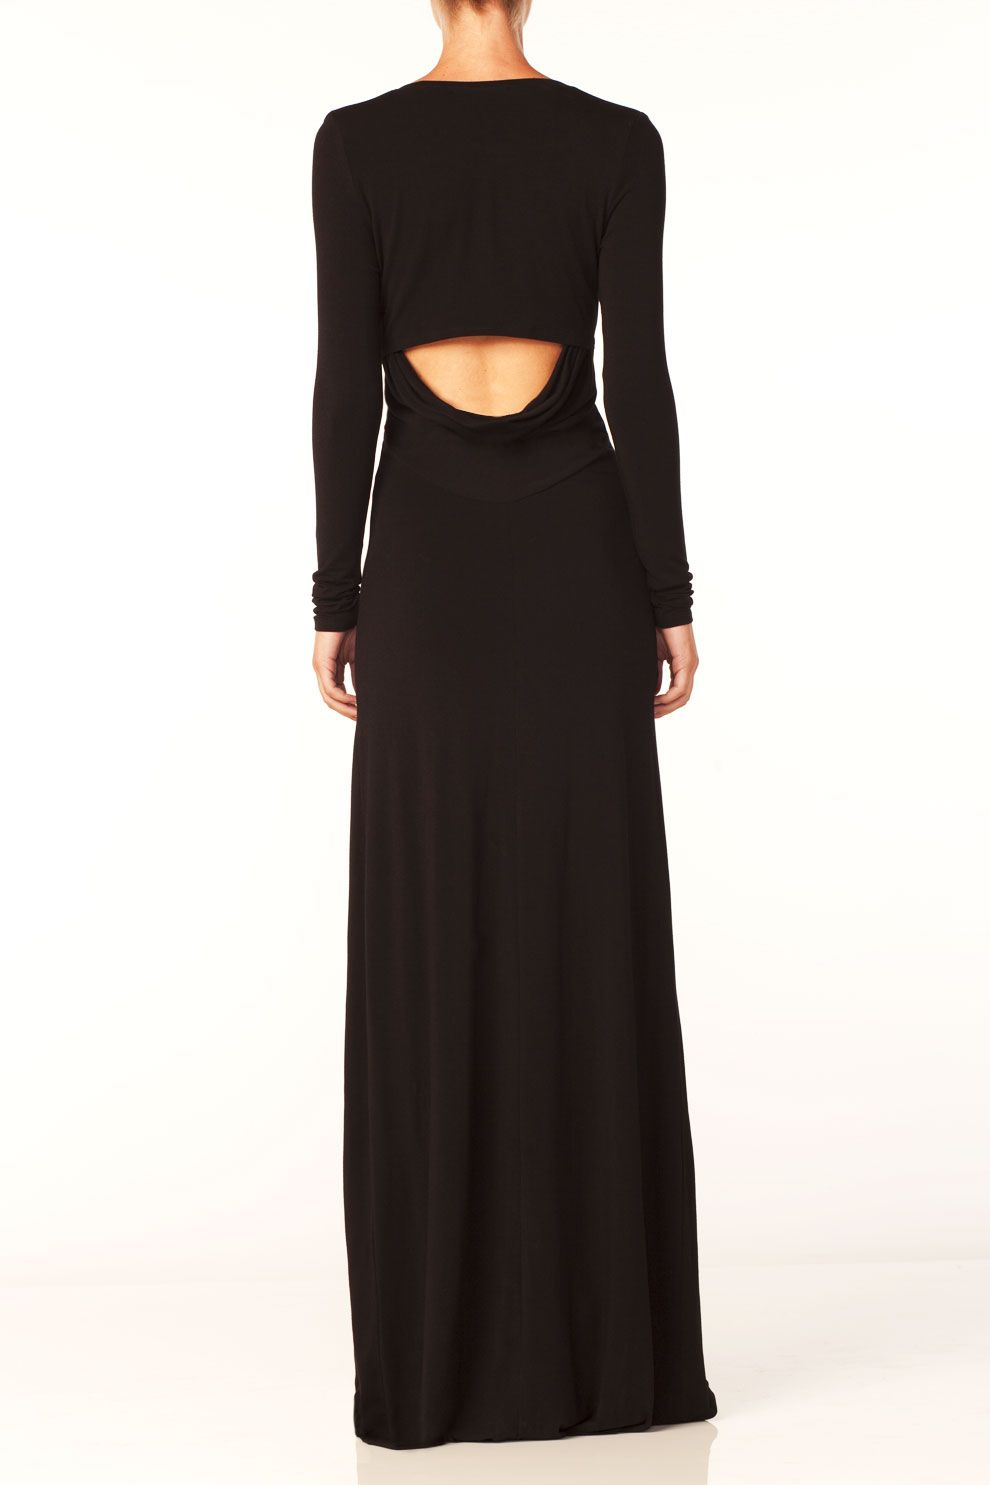 Bella luxx long sleeve slit maxi dress inspiration in dress